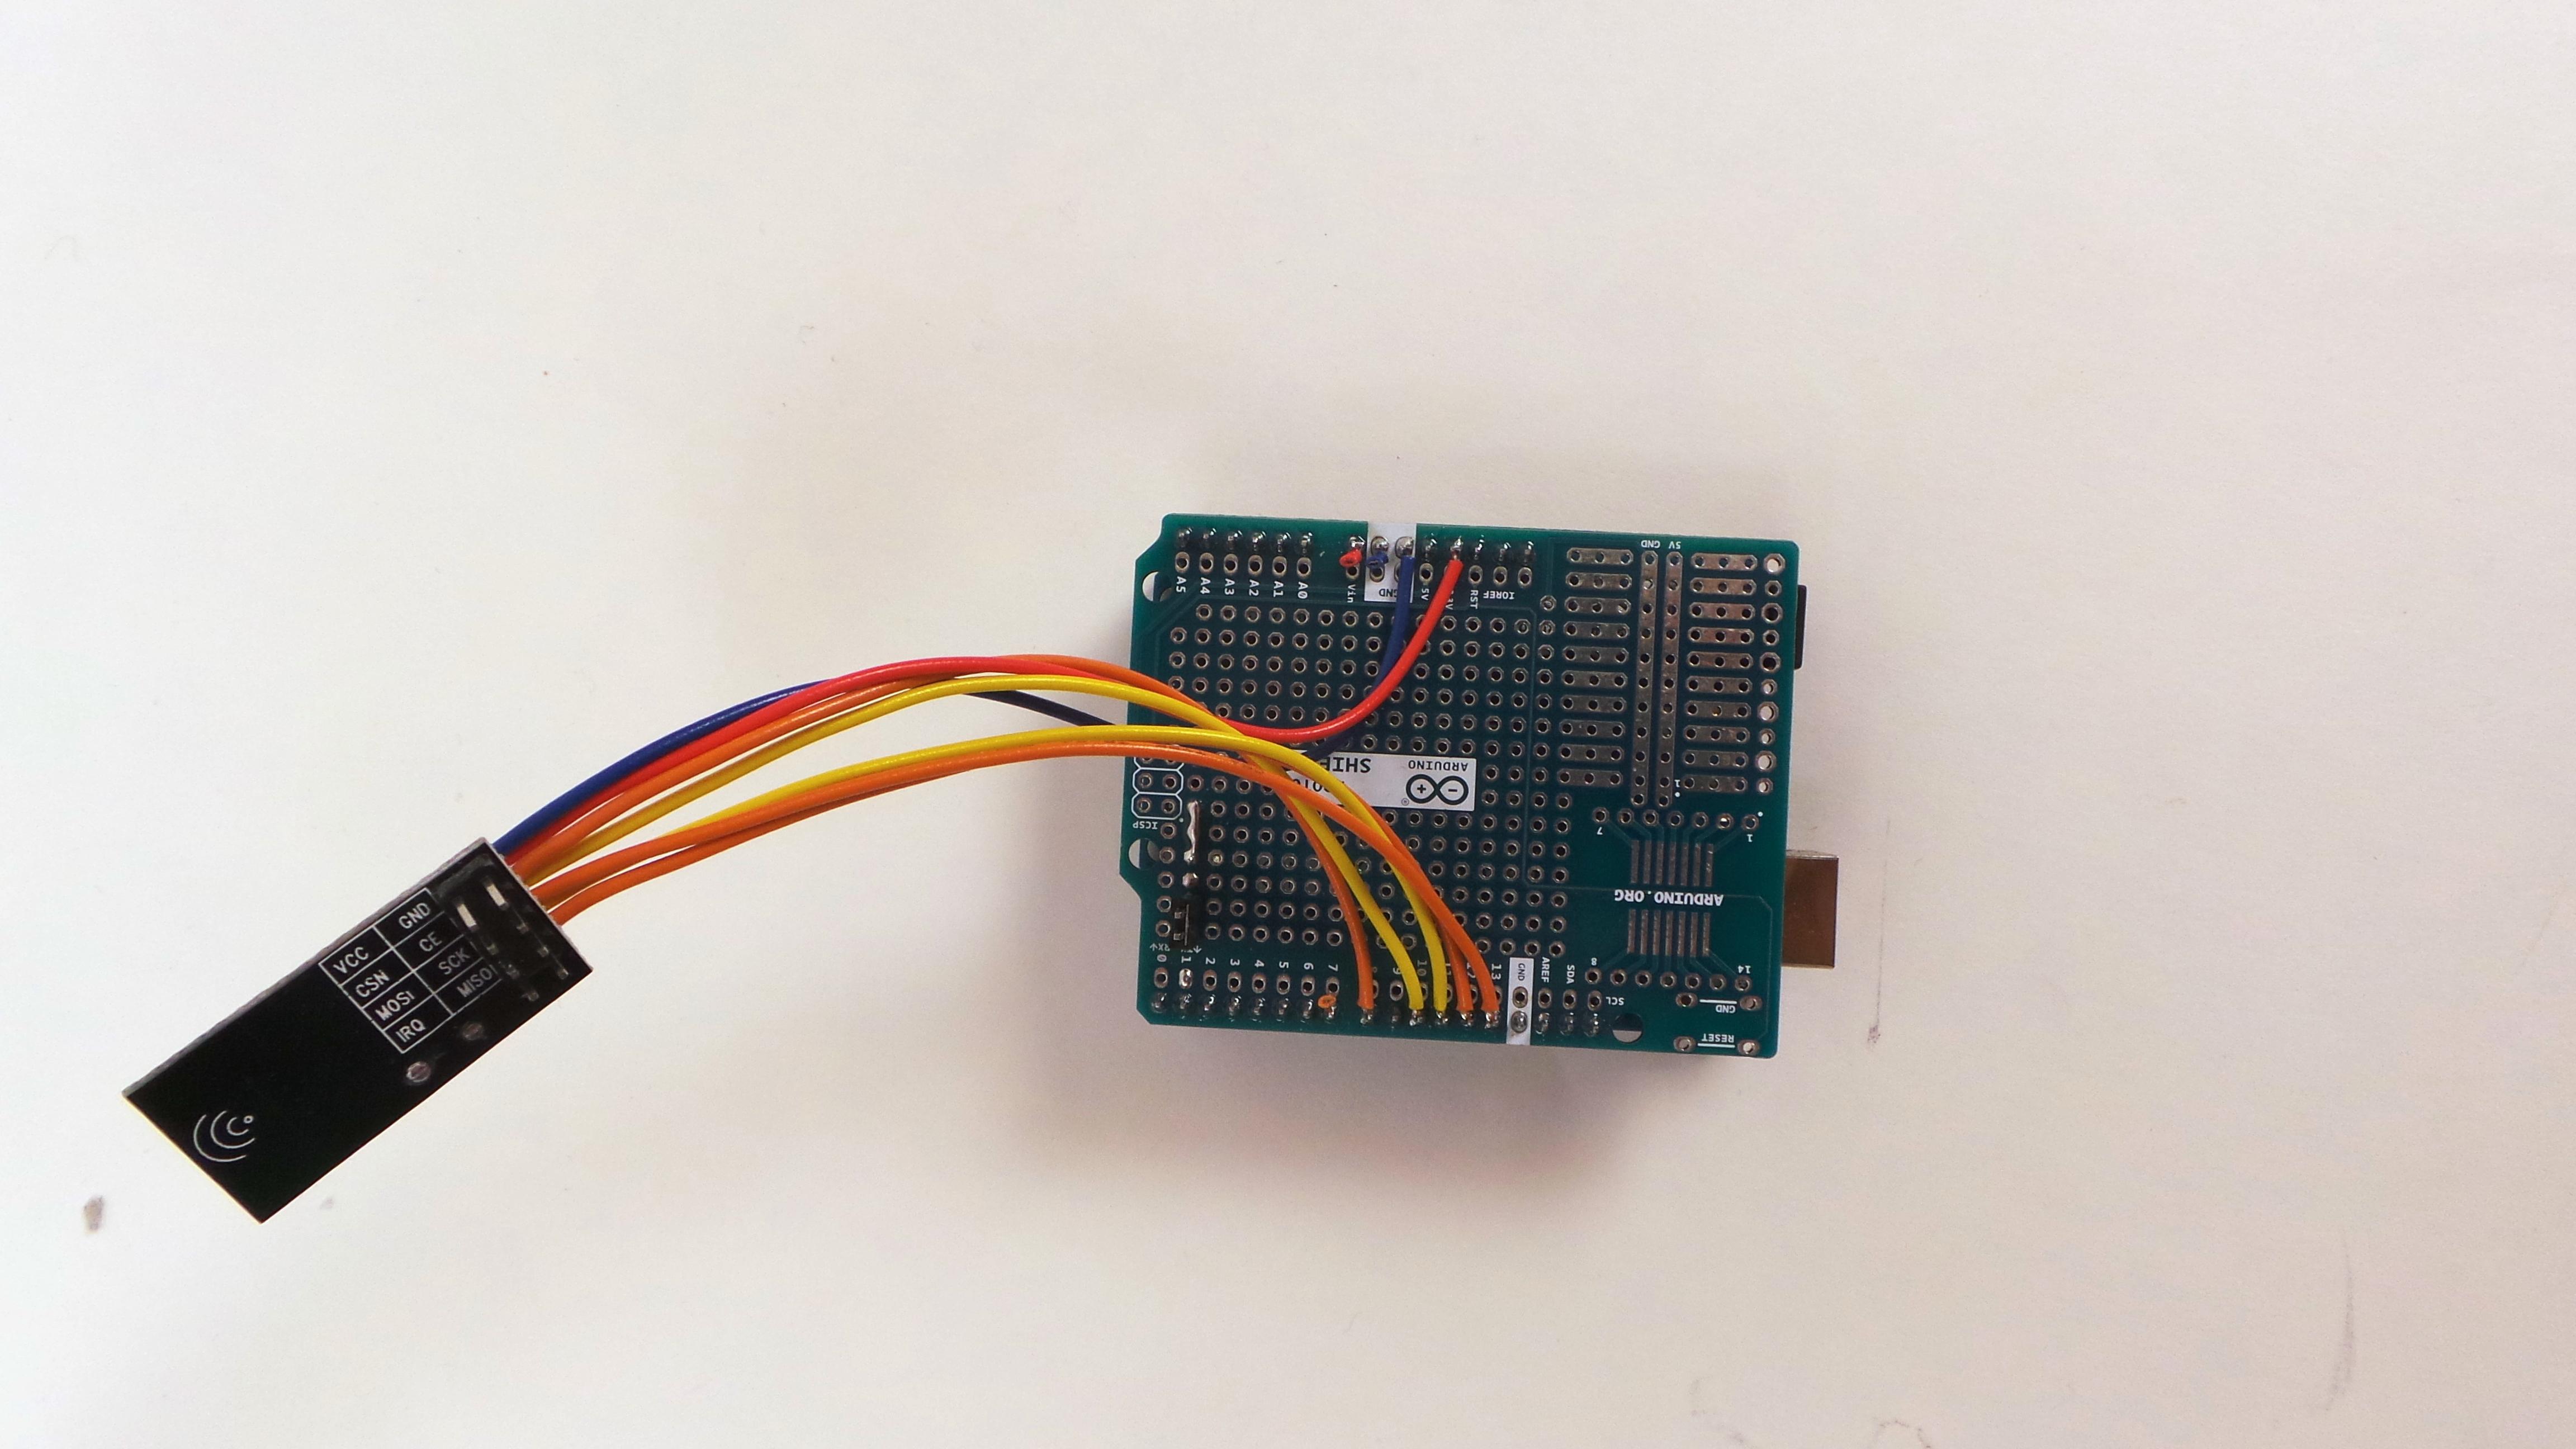 Controlling The Mi Light From Arduino Or Nodemcu